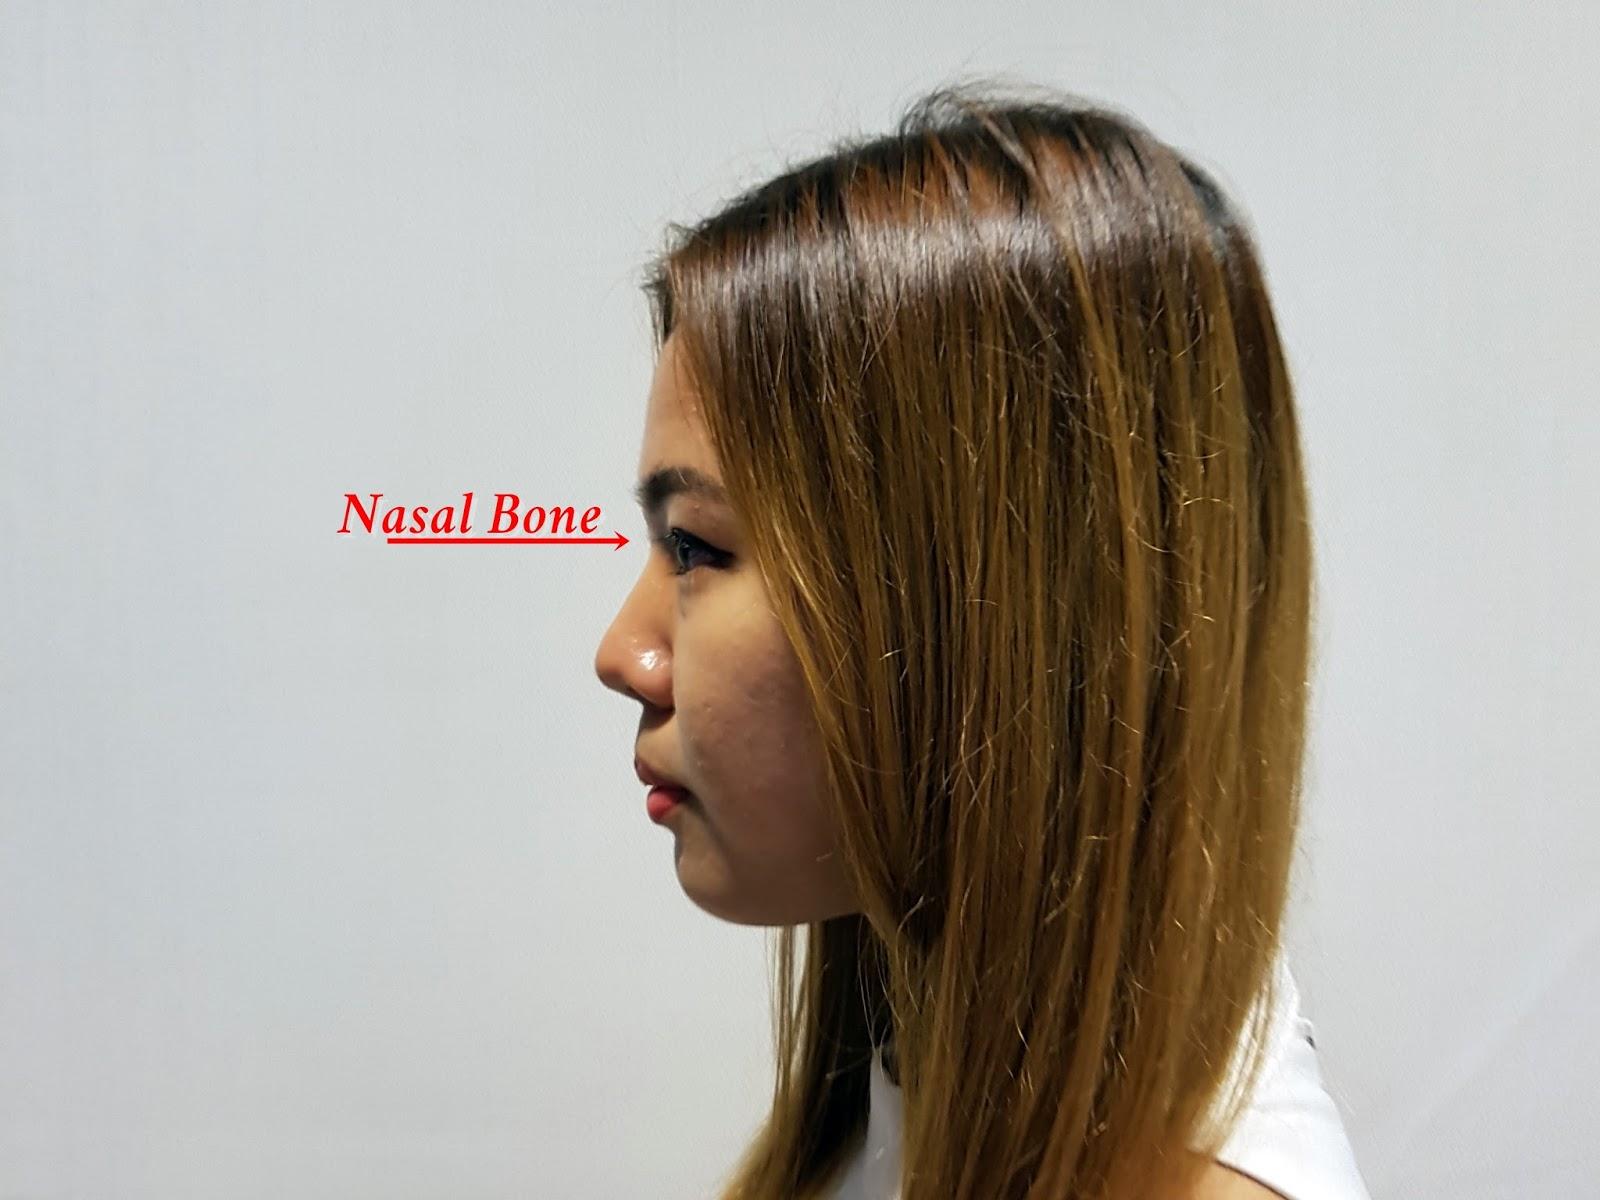 Nose Enhancement | Serene's Blog